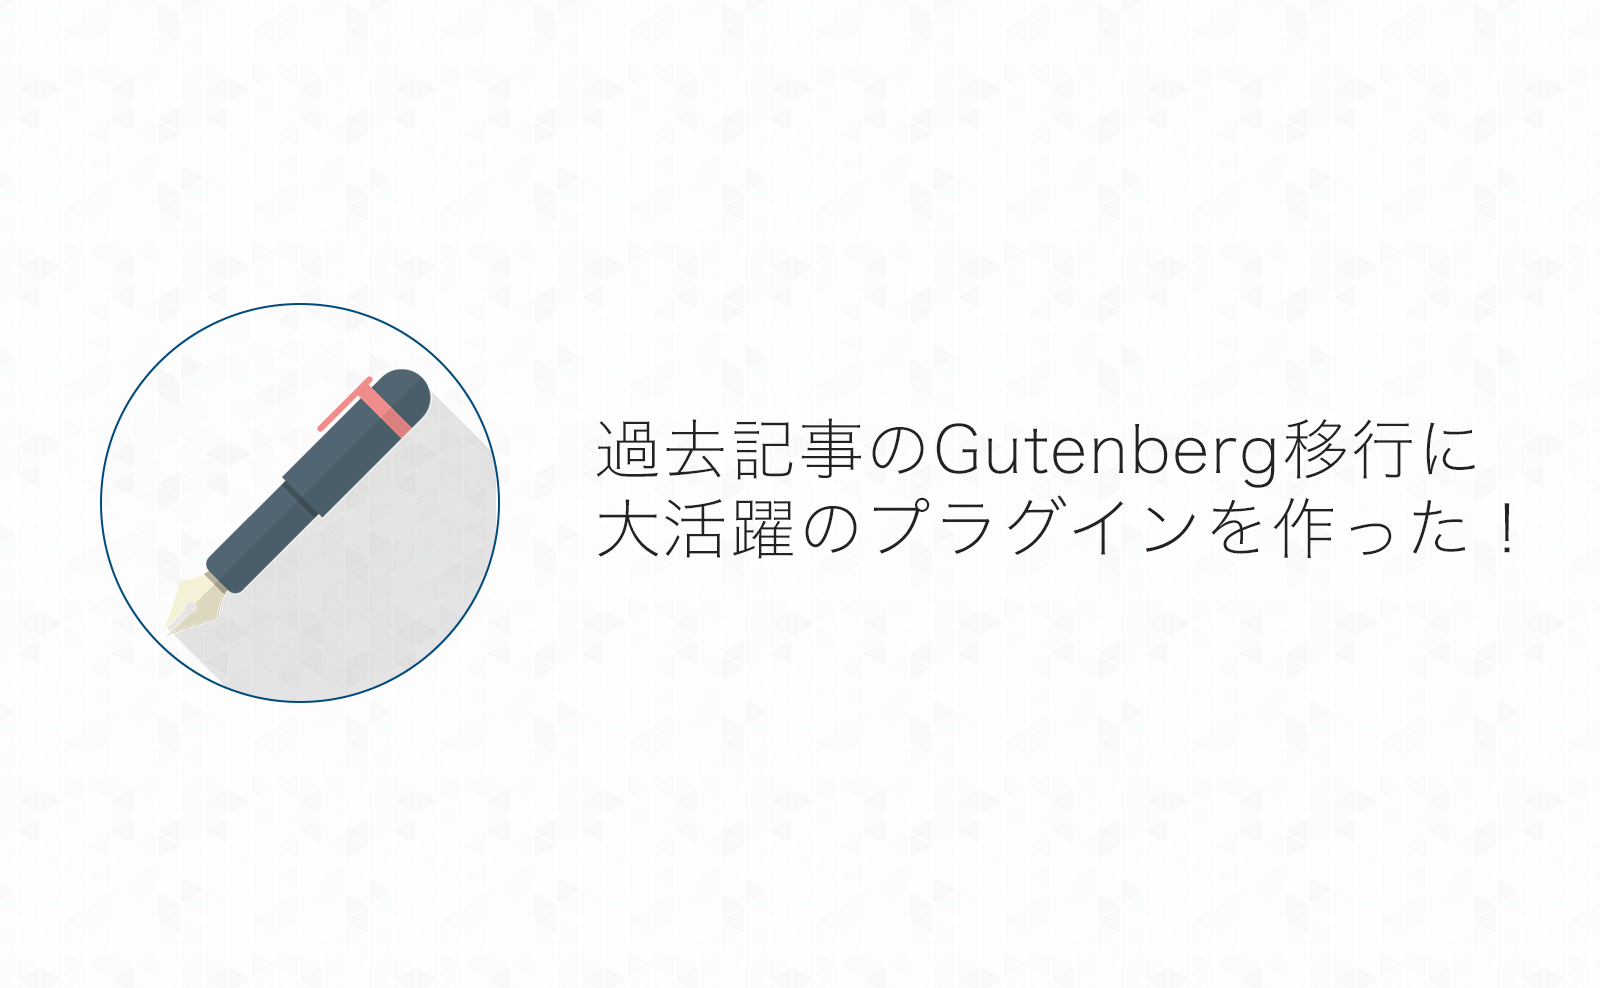 【WordPress】Gutenberg移行に大活躍!記事ごとにブロックエディターを有効化するプラグインを作りました!